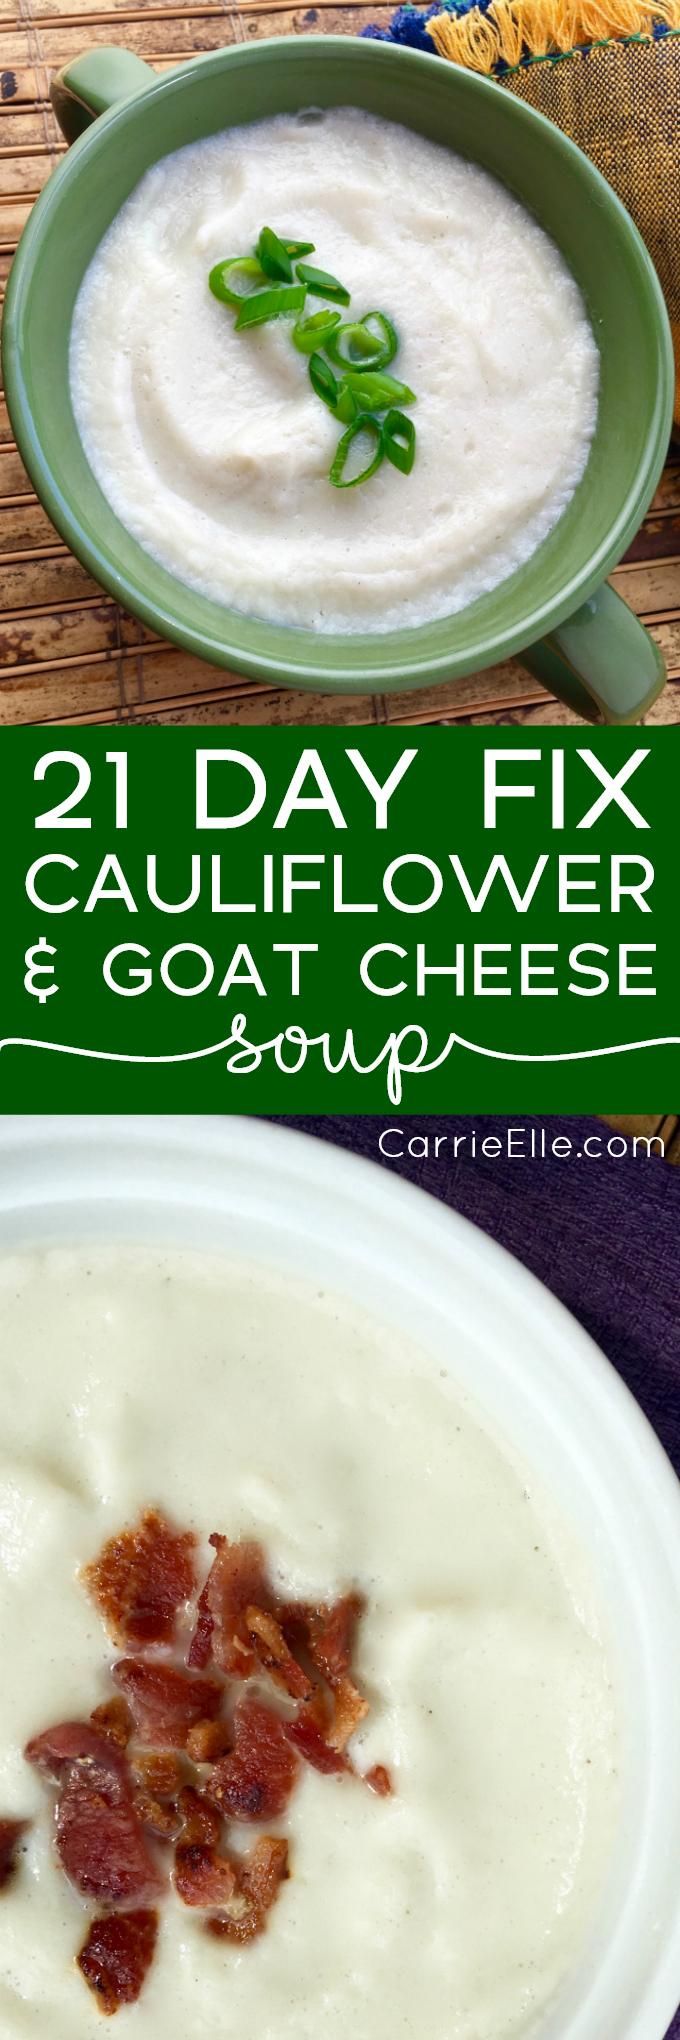 21 Day Fix Cauliflower Soup